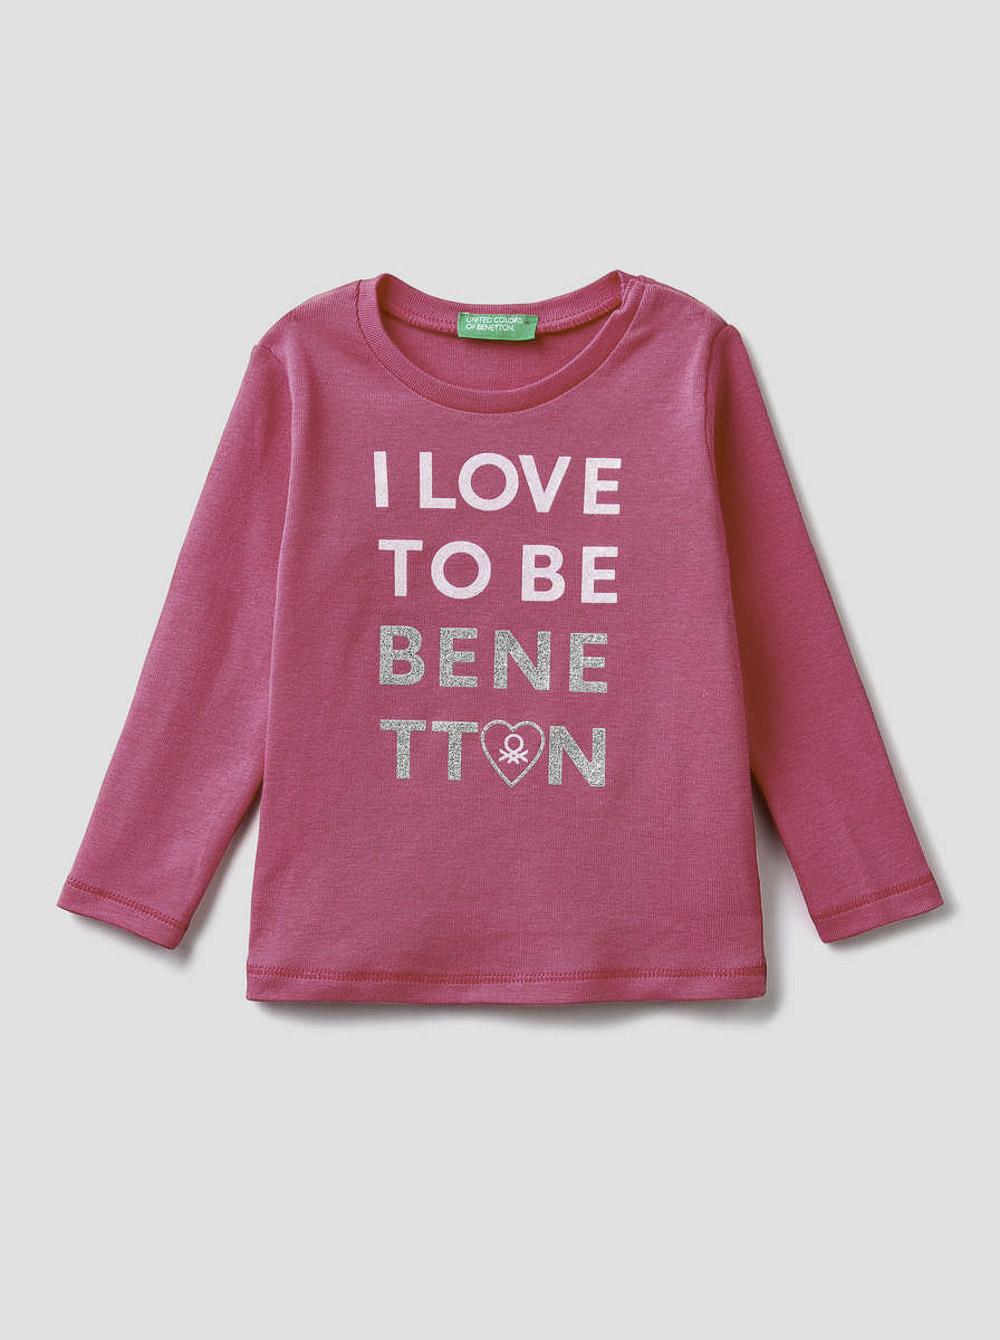 012 BENETTON T-shirt μακρυμάνικο με λογότυπο 3I9WC14QX 20A02A